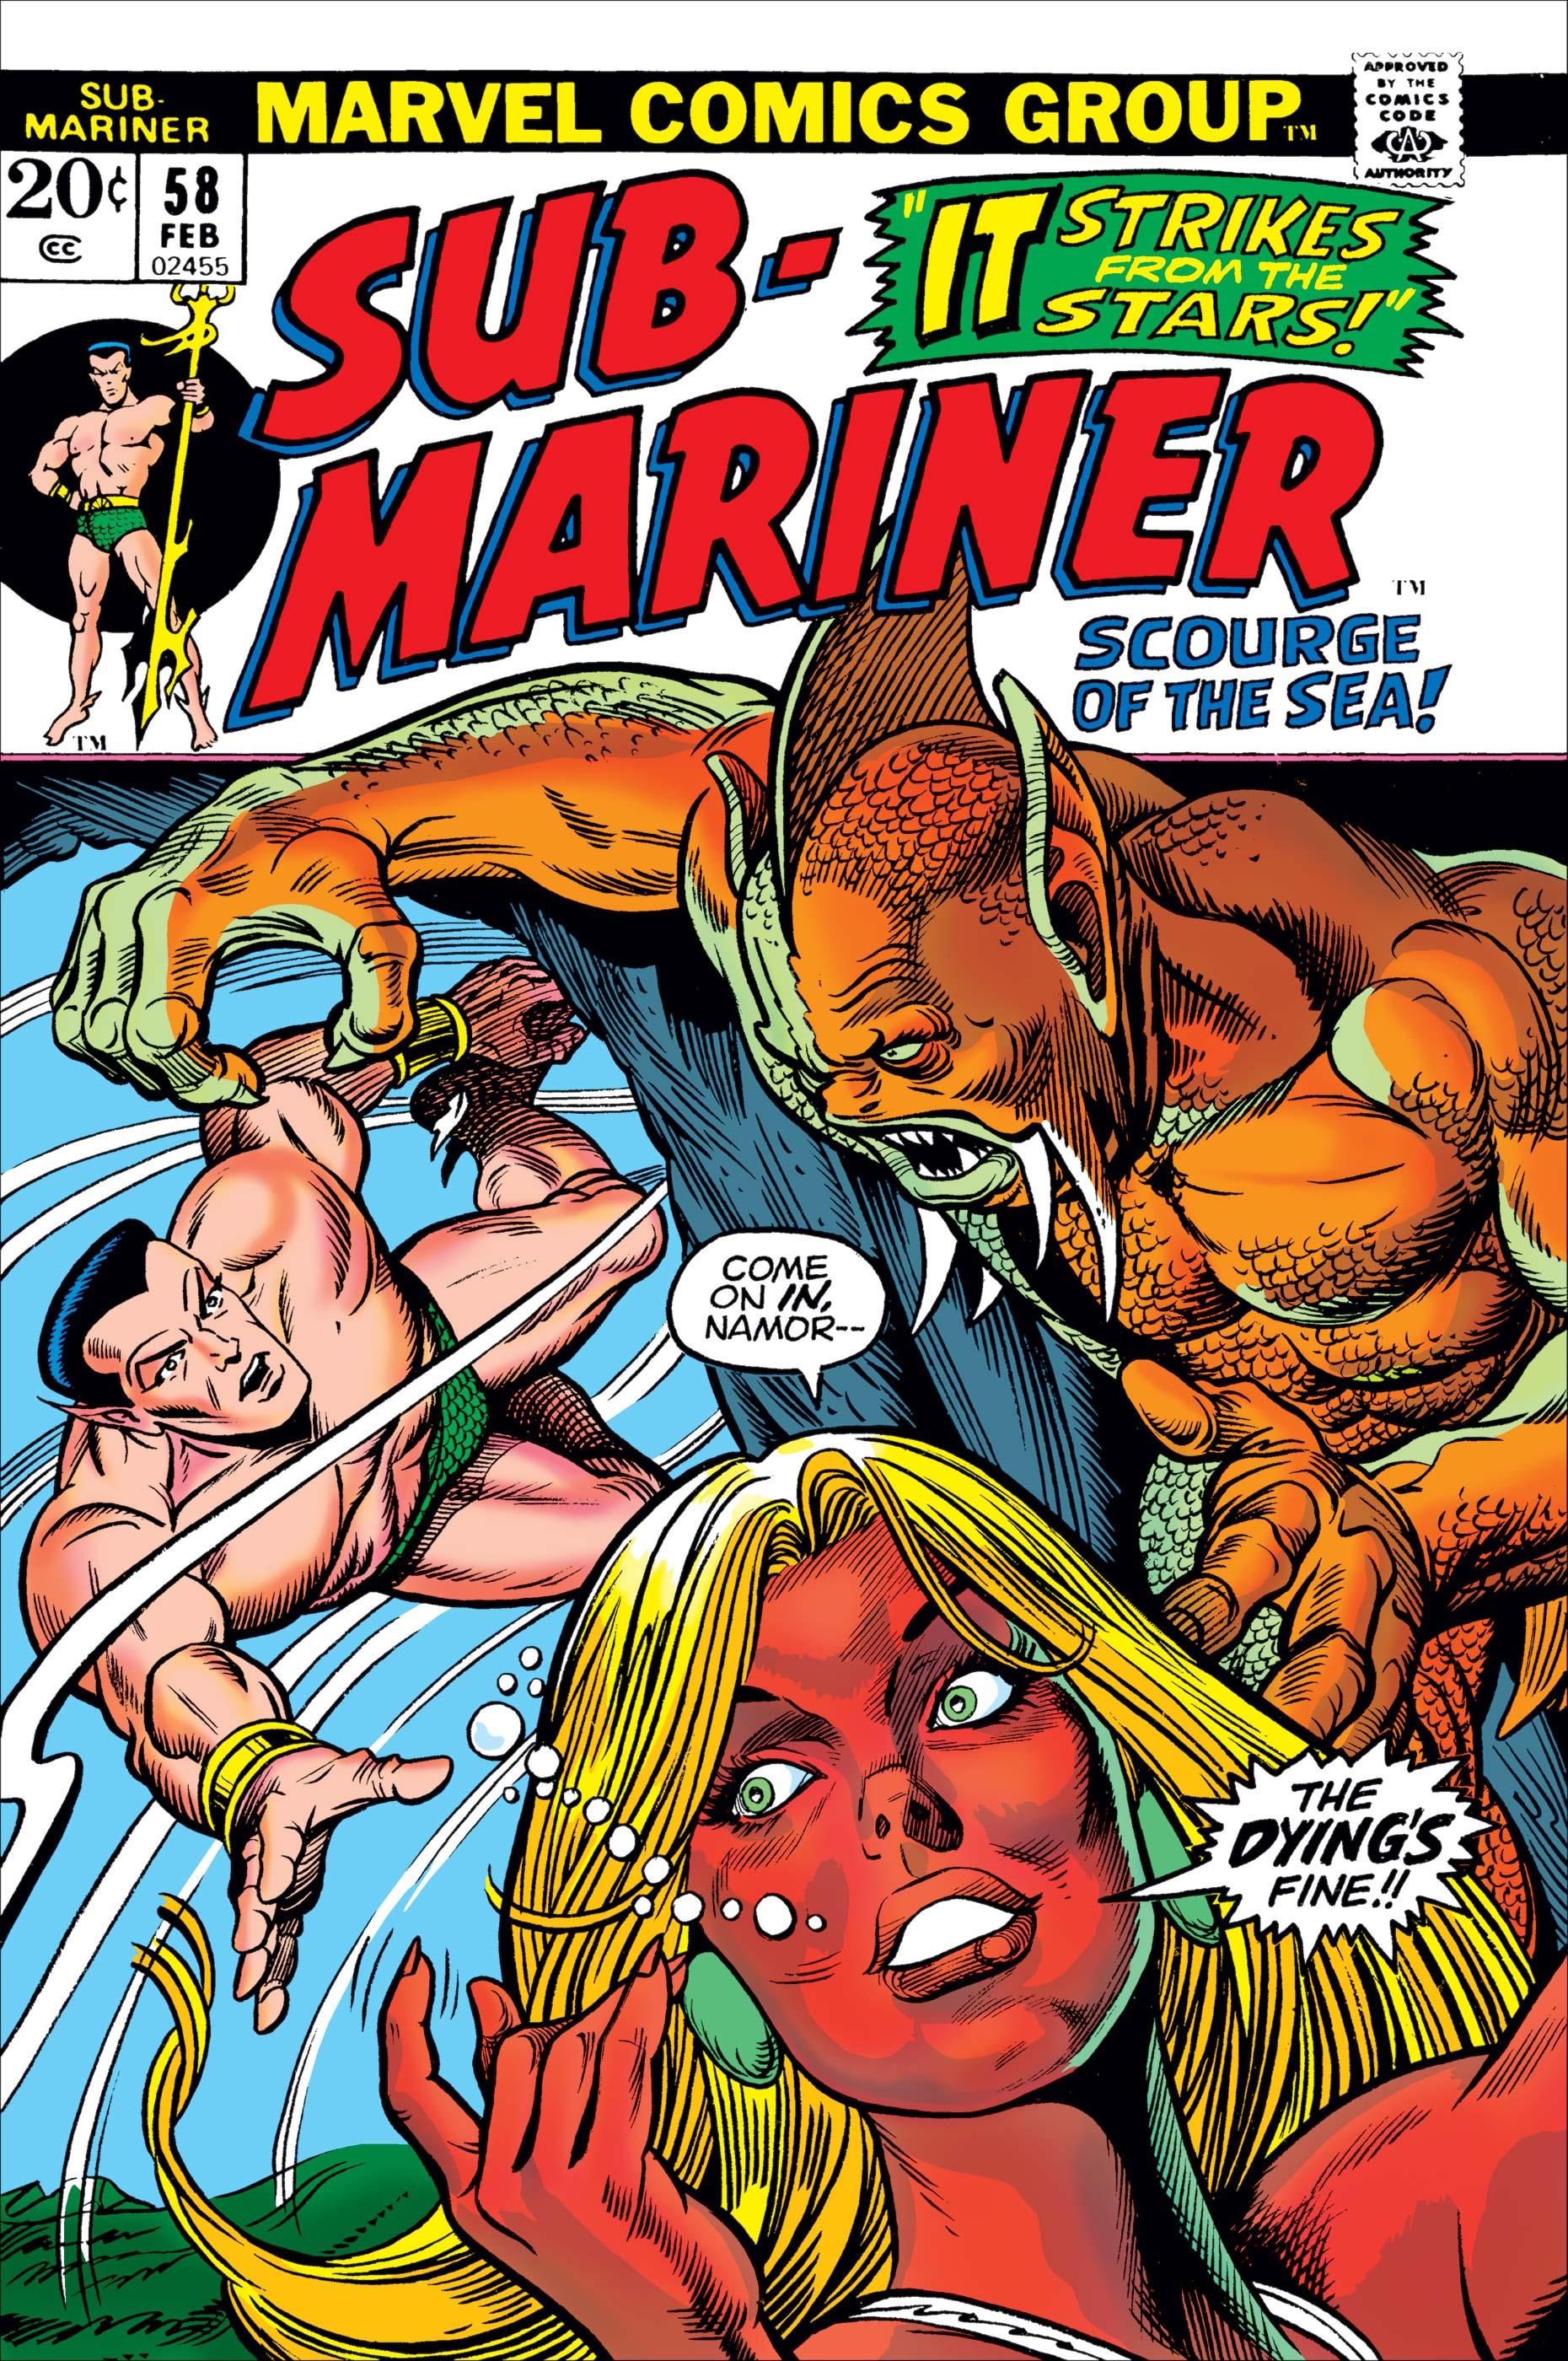 Sub-Mariner (1968) #58